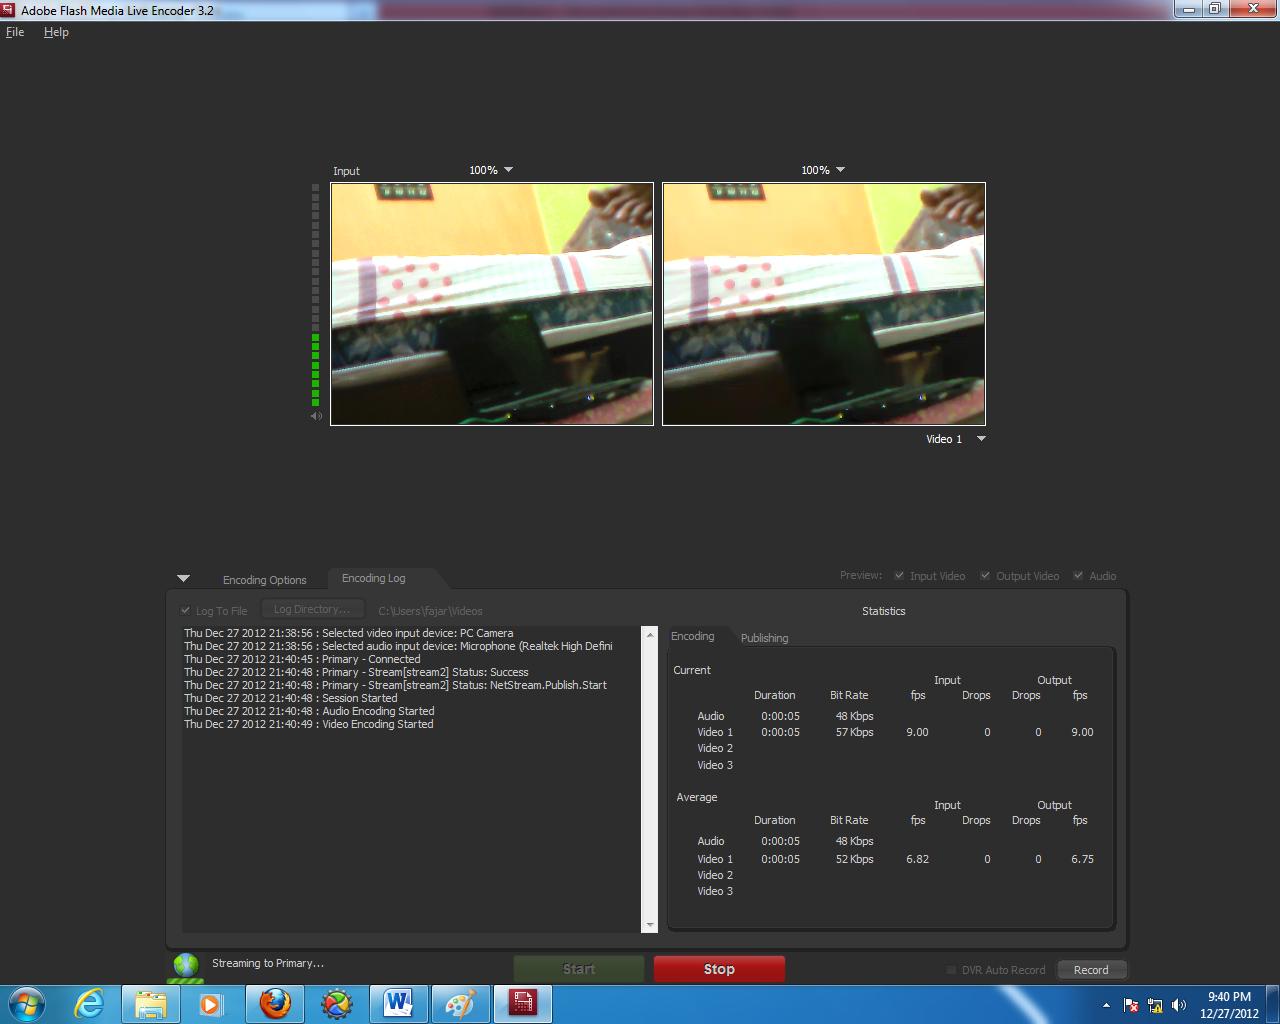 Gambar 3.12 Tampilan Adobe Flash Media Live Encoder jika sedang berjalan.png